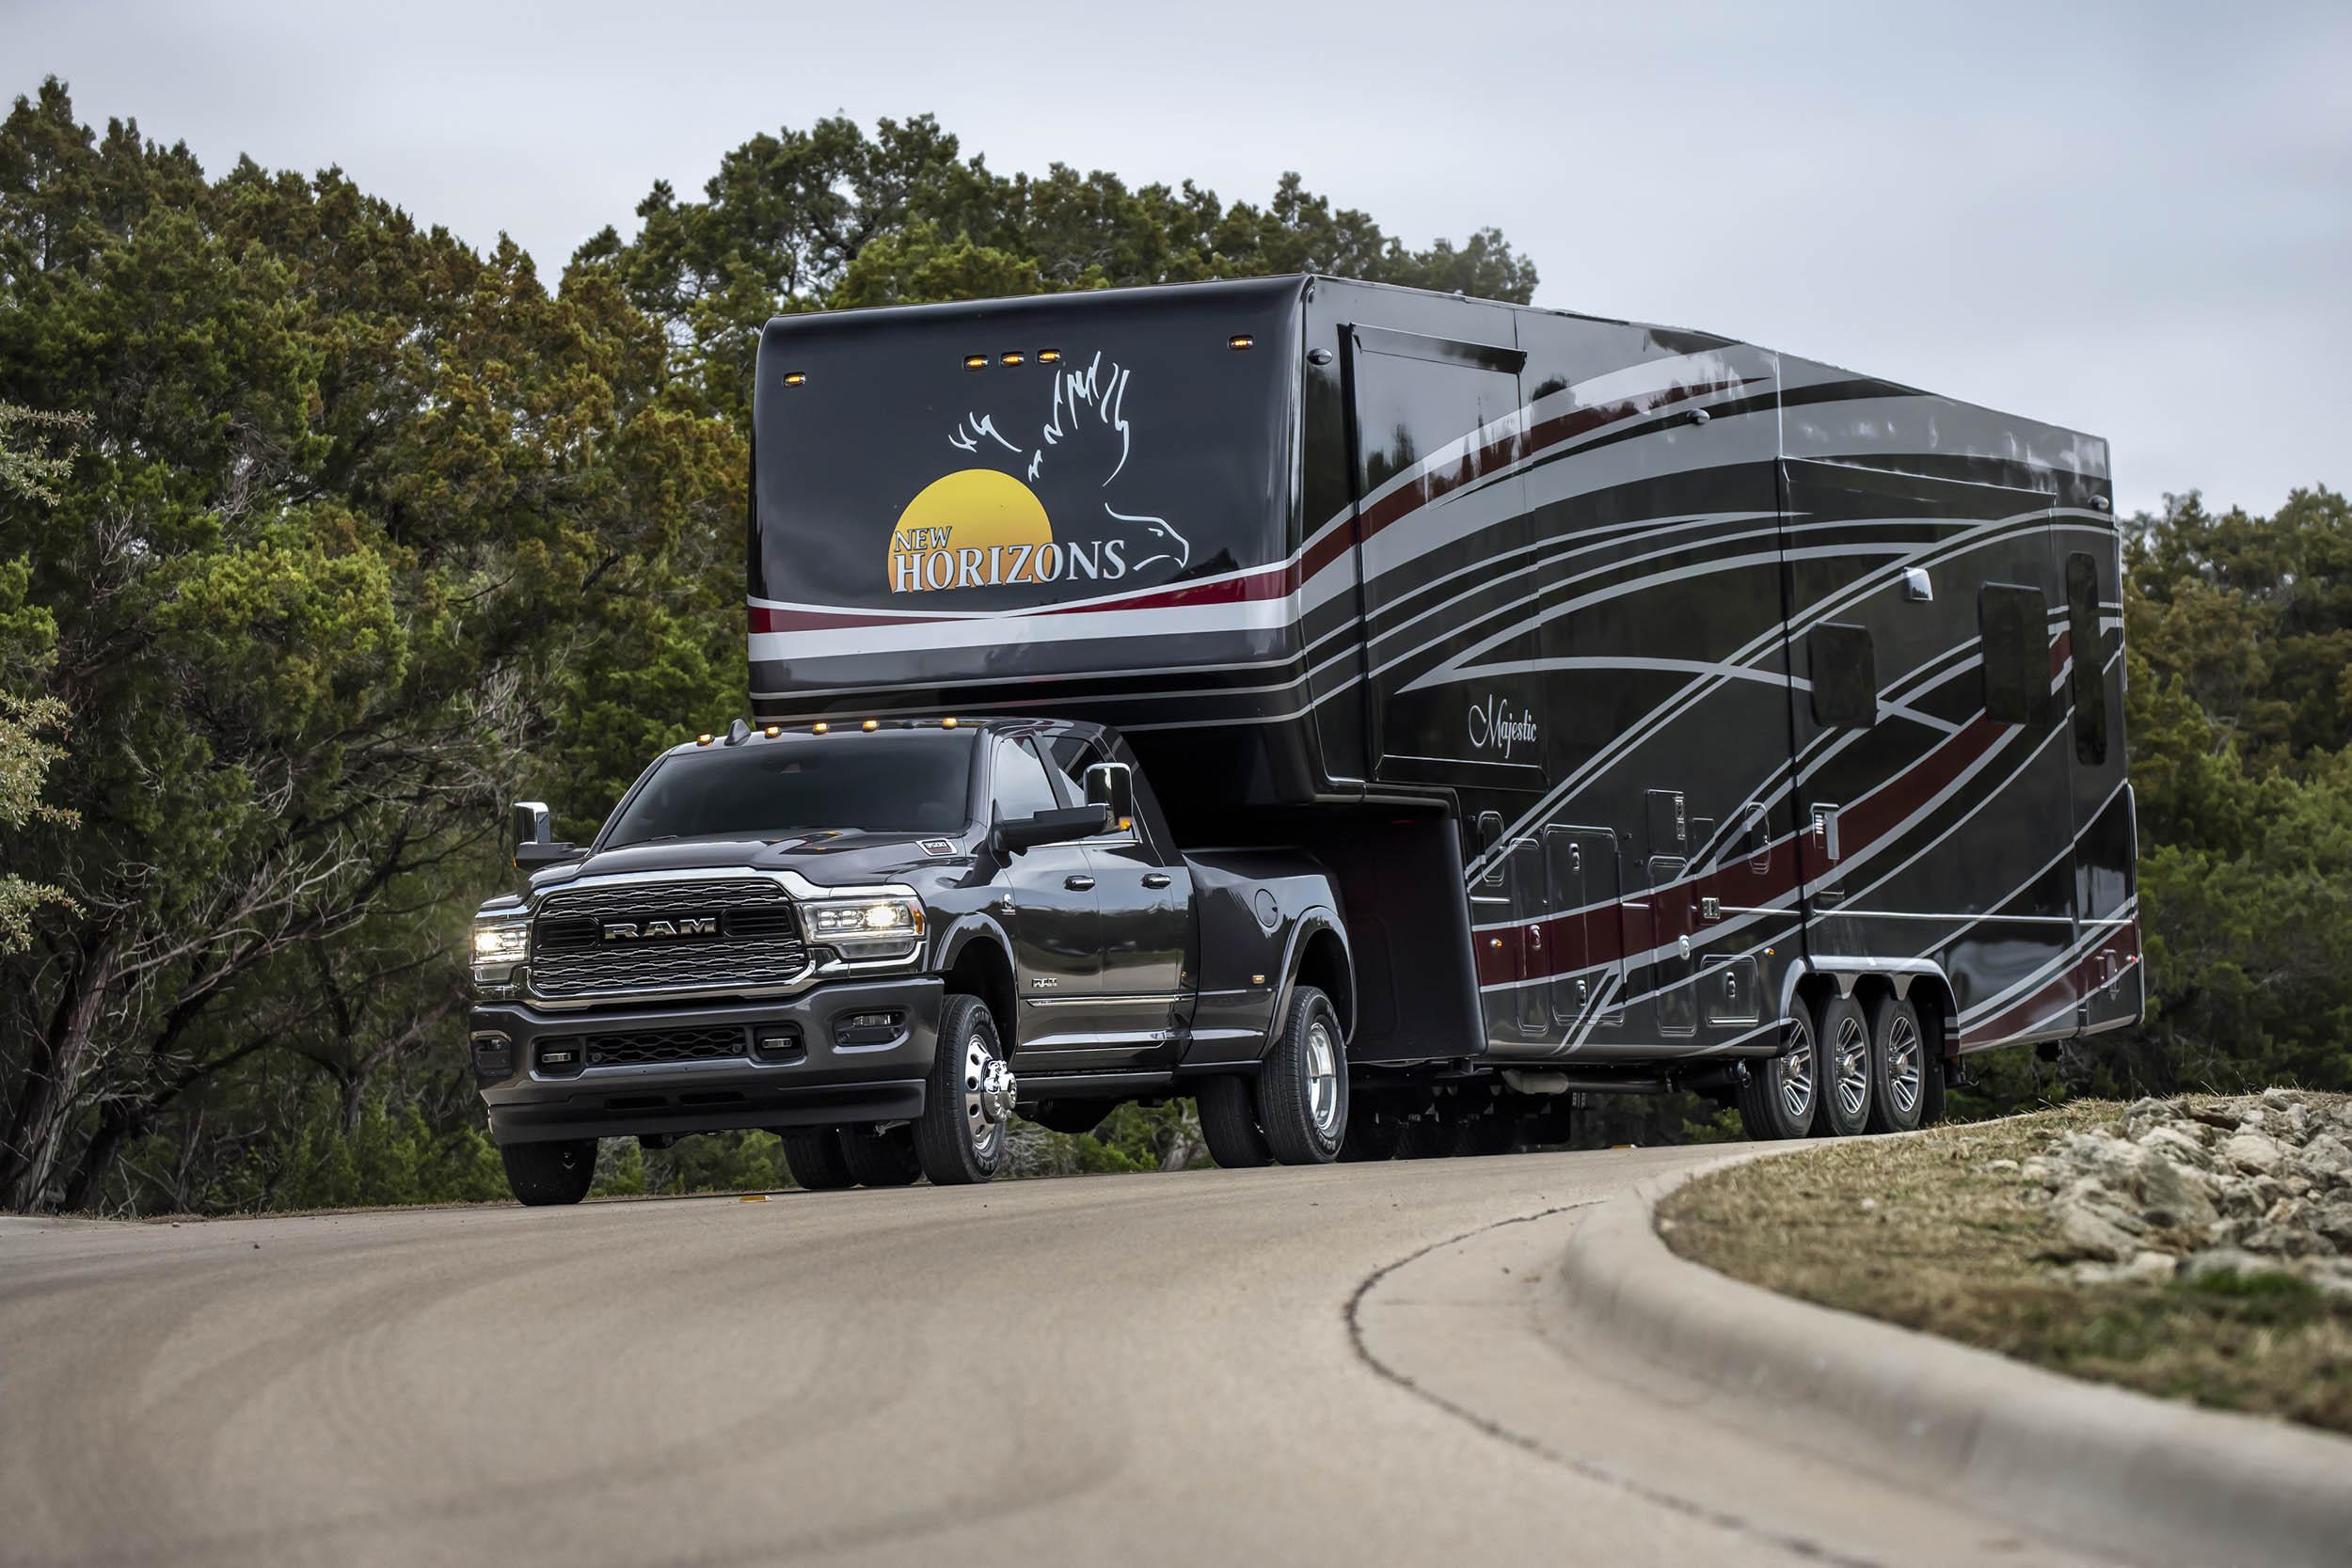 2019 RAM 3500 pulling a trailer